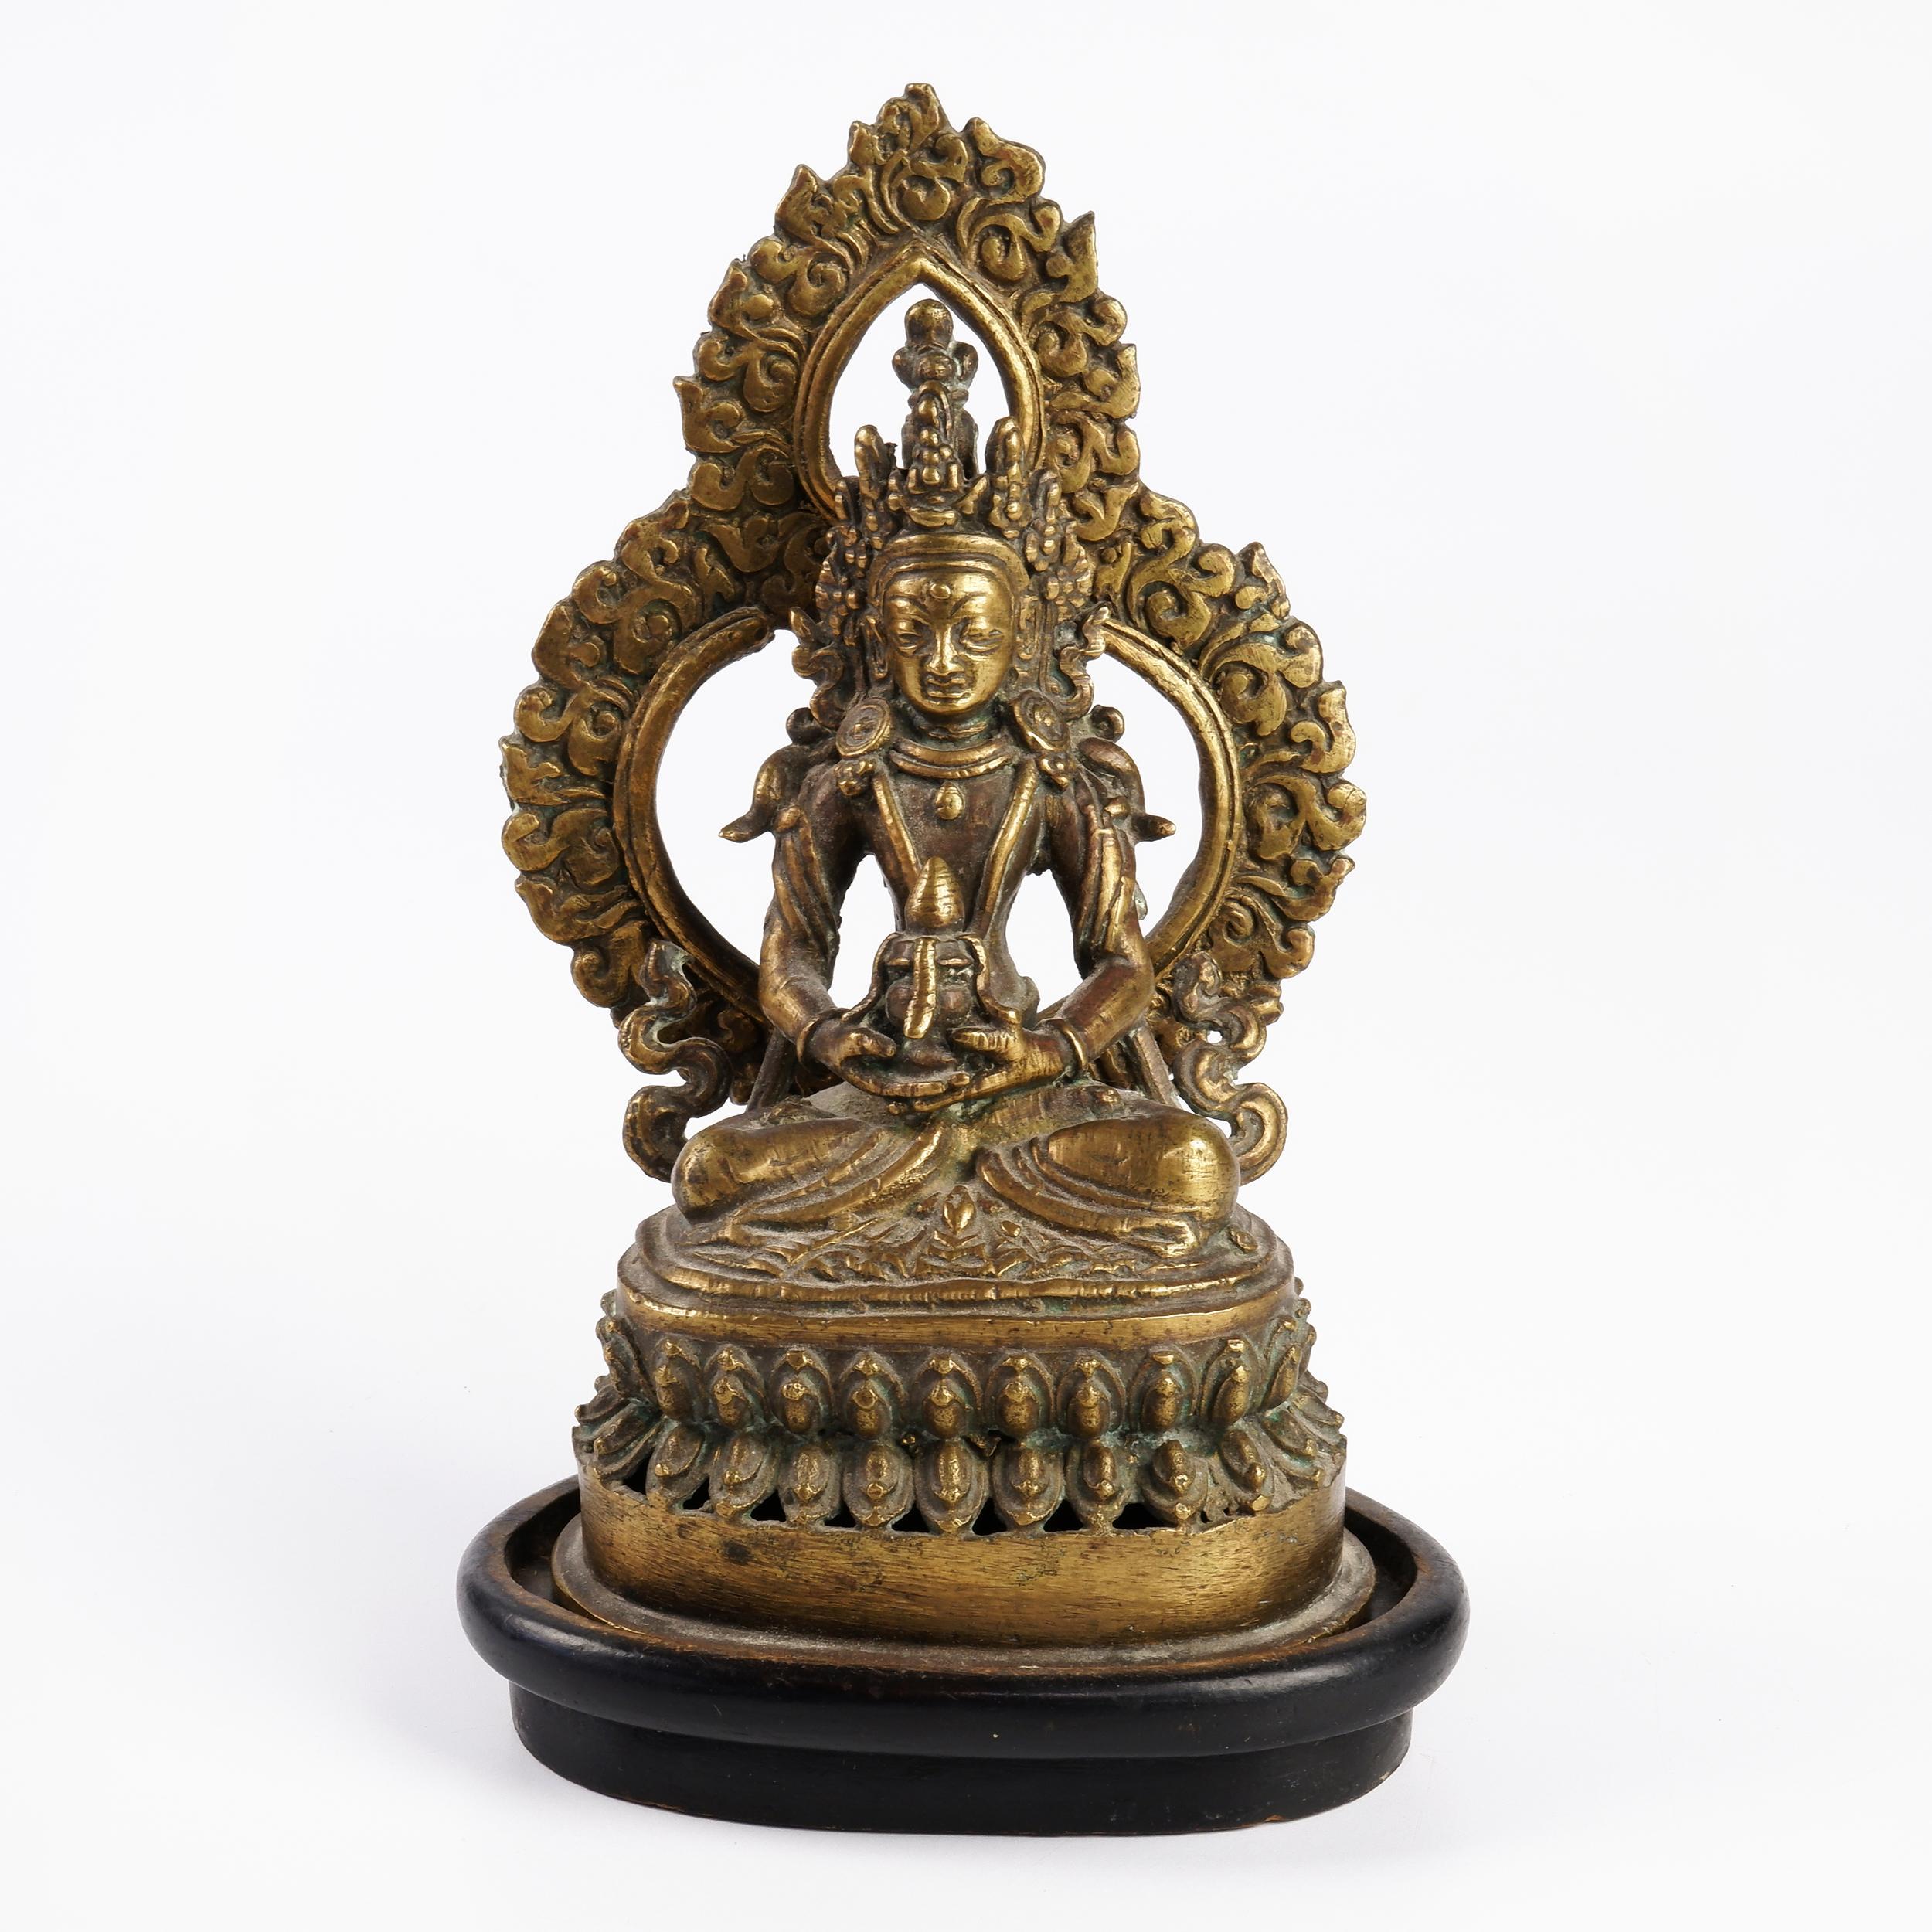 'Cast Bronze Figure of Buddha Amitayus Seated Beneath a Flaming Mandorla on a Double Lotus Base'